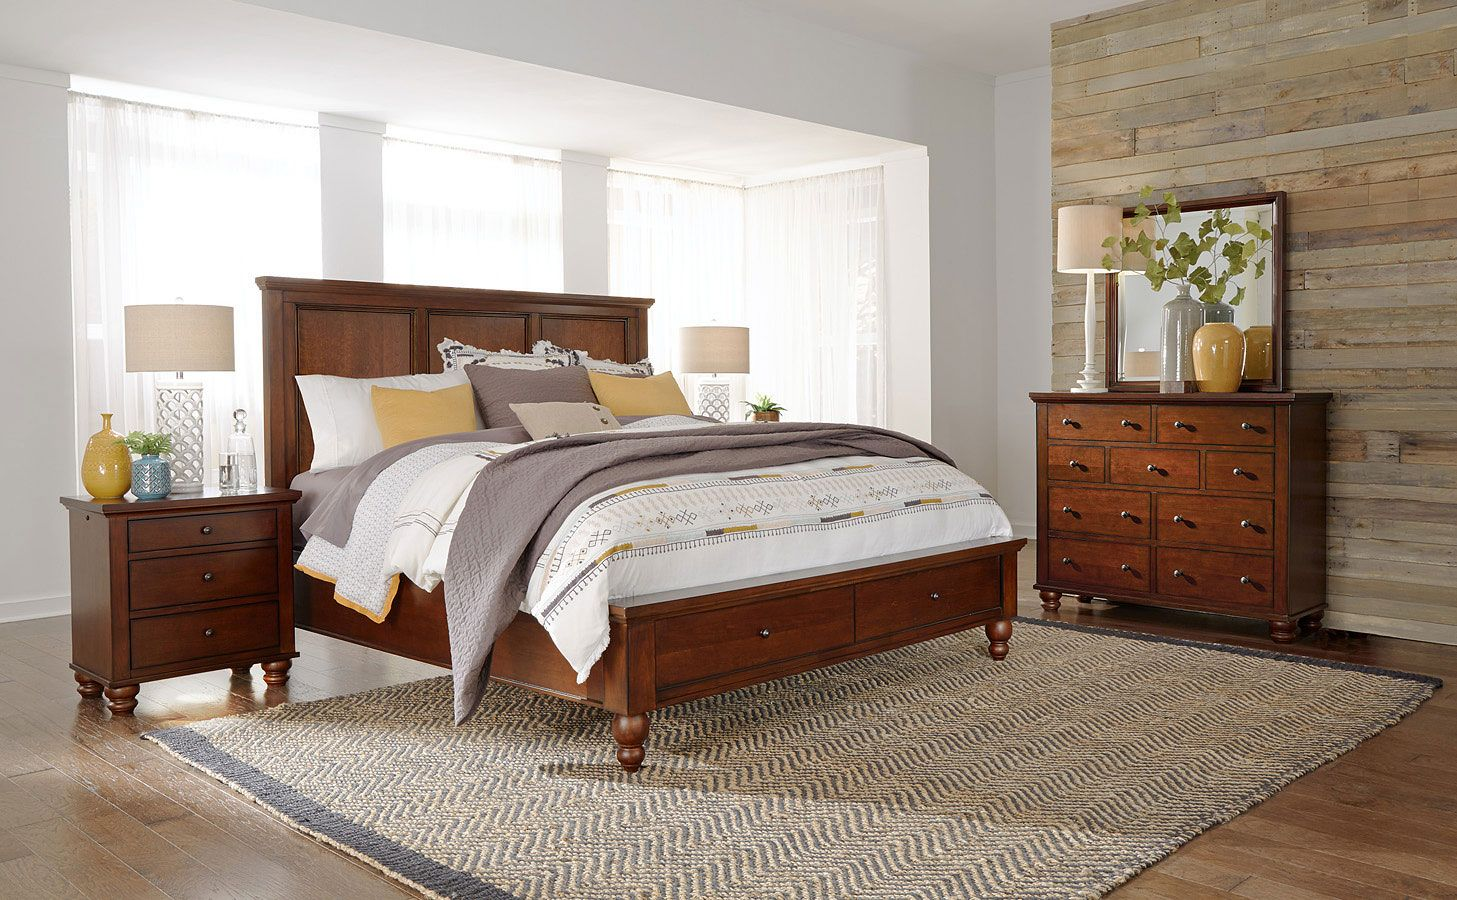 Cambridge Flat Panel Storage Bedroom Set Brown Cherry Bedroom Sets Aspen Furniture Furniture